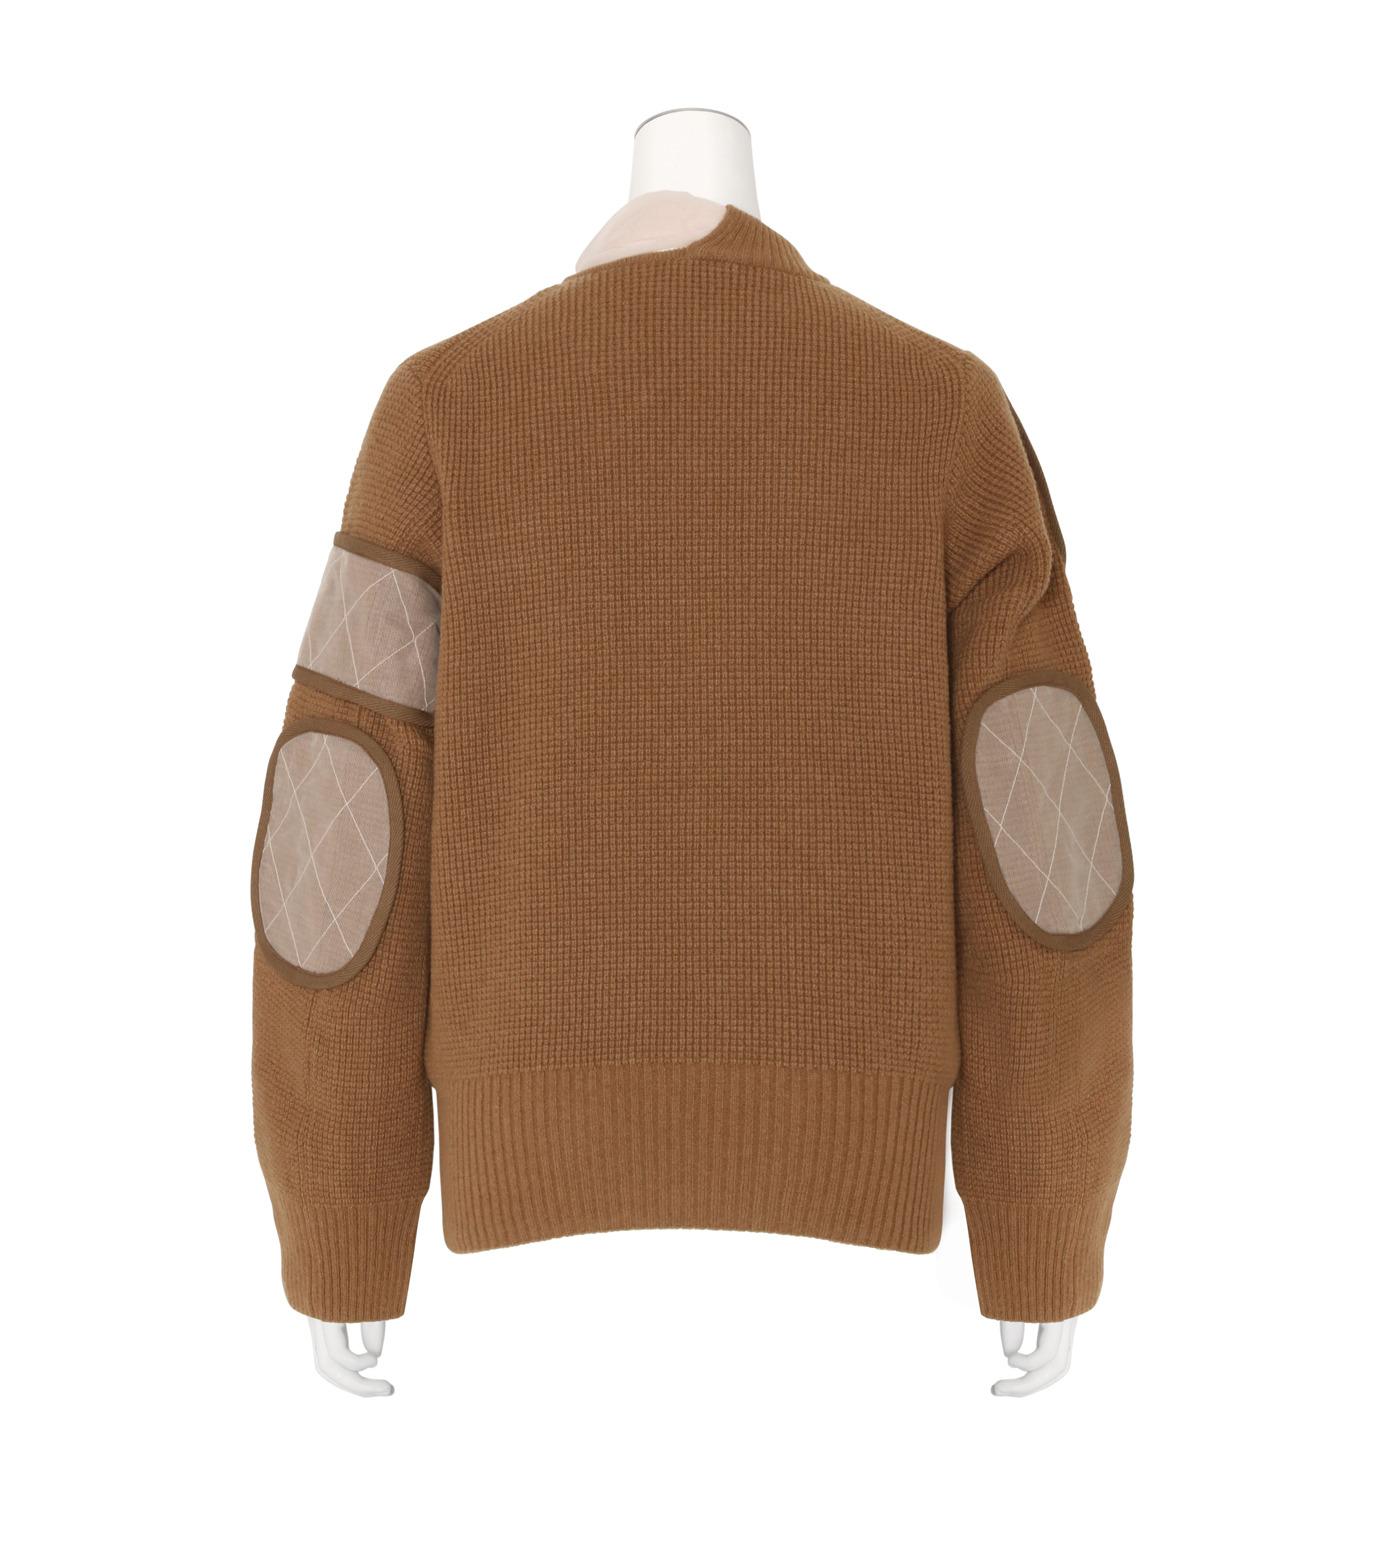 Sacai(サカイ)のLS Military Sweater w/Chiffon Scarf-CAMEL(ニット/knit)-16-02855-53 拡大詳細画像2